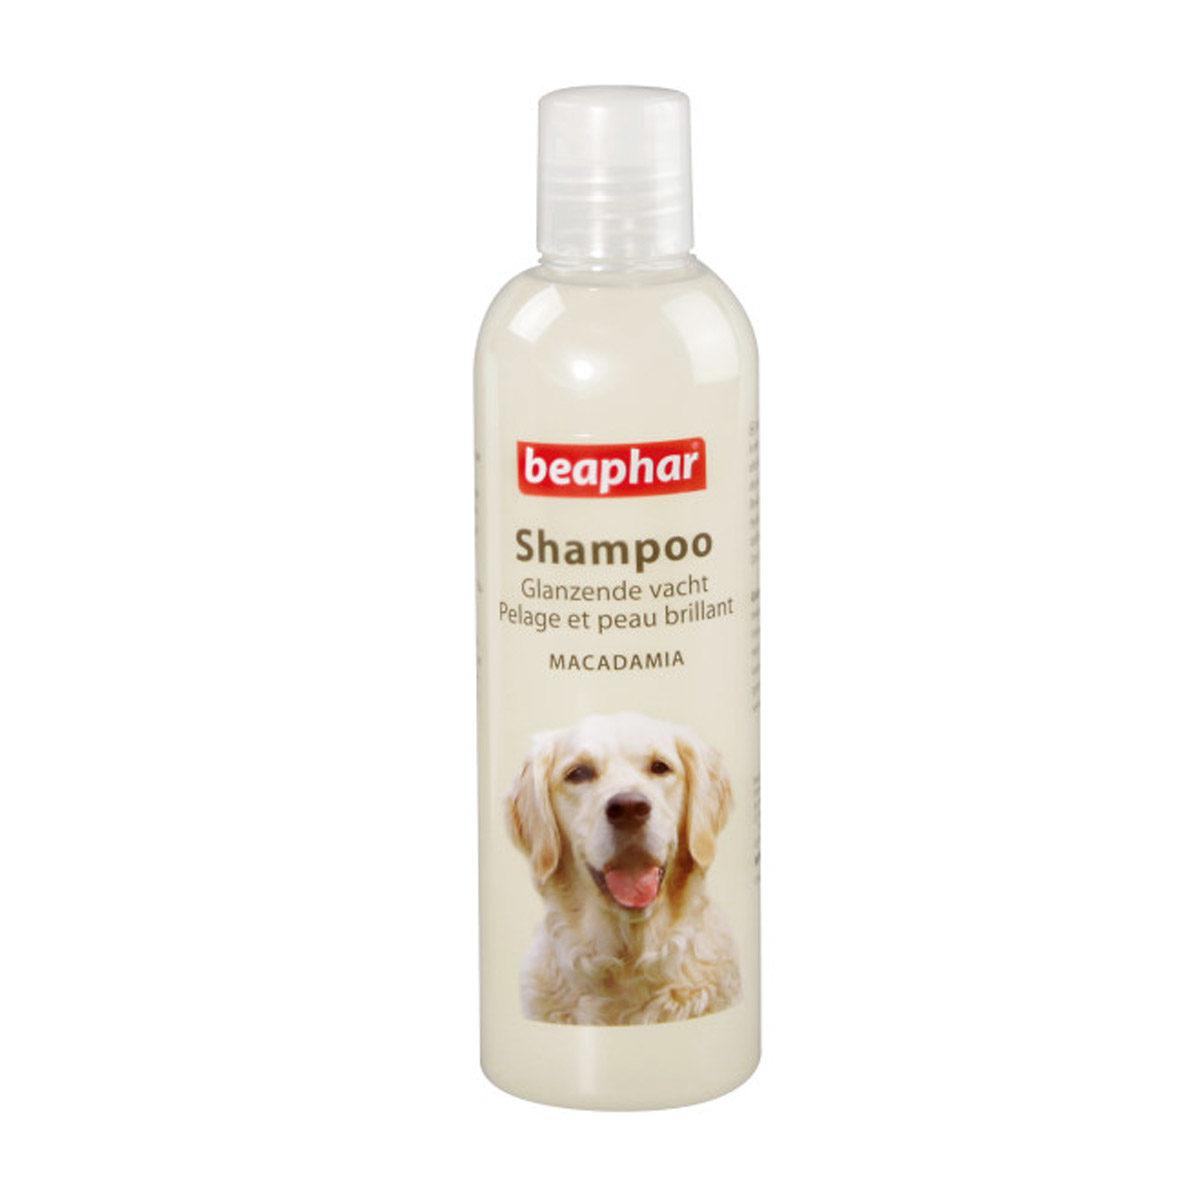 Beaphar Shampoo Hond Glanzende-Vacht 250ml